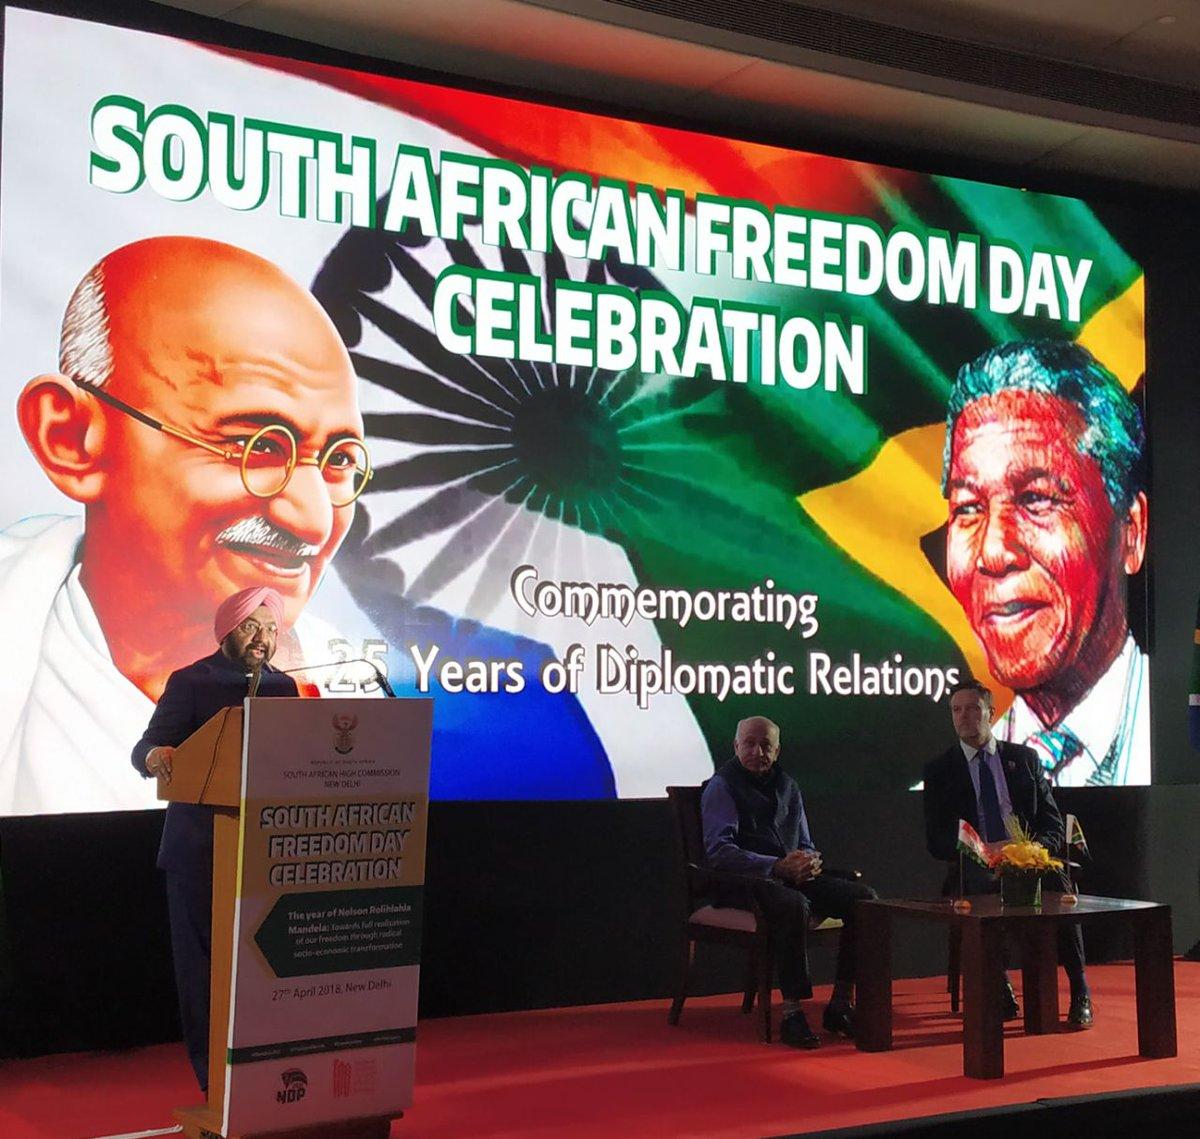 Vikramjit Sahney On Twitter Greetings On National Day Of